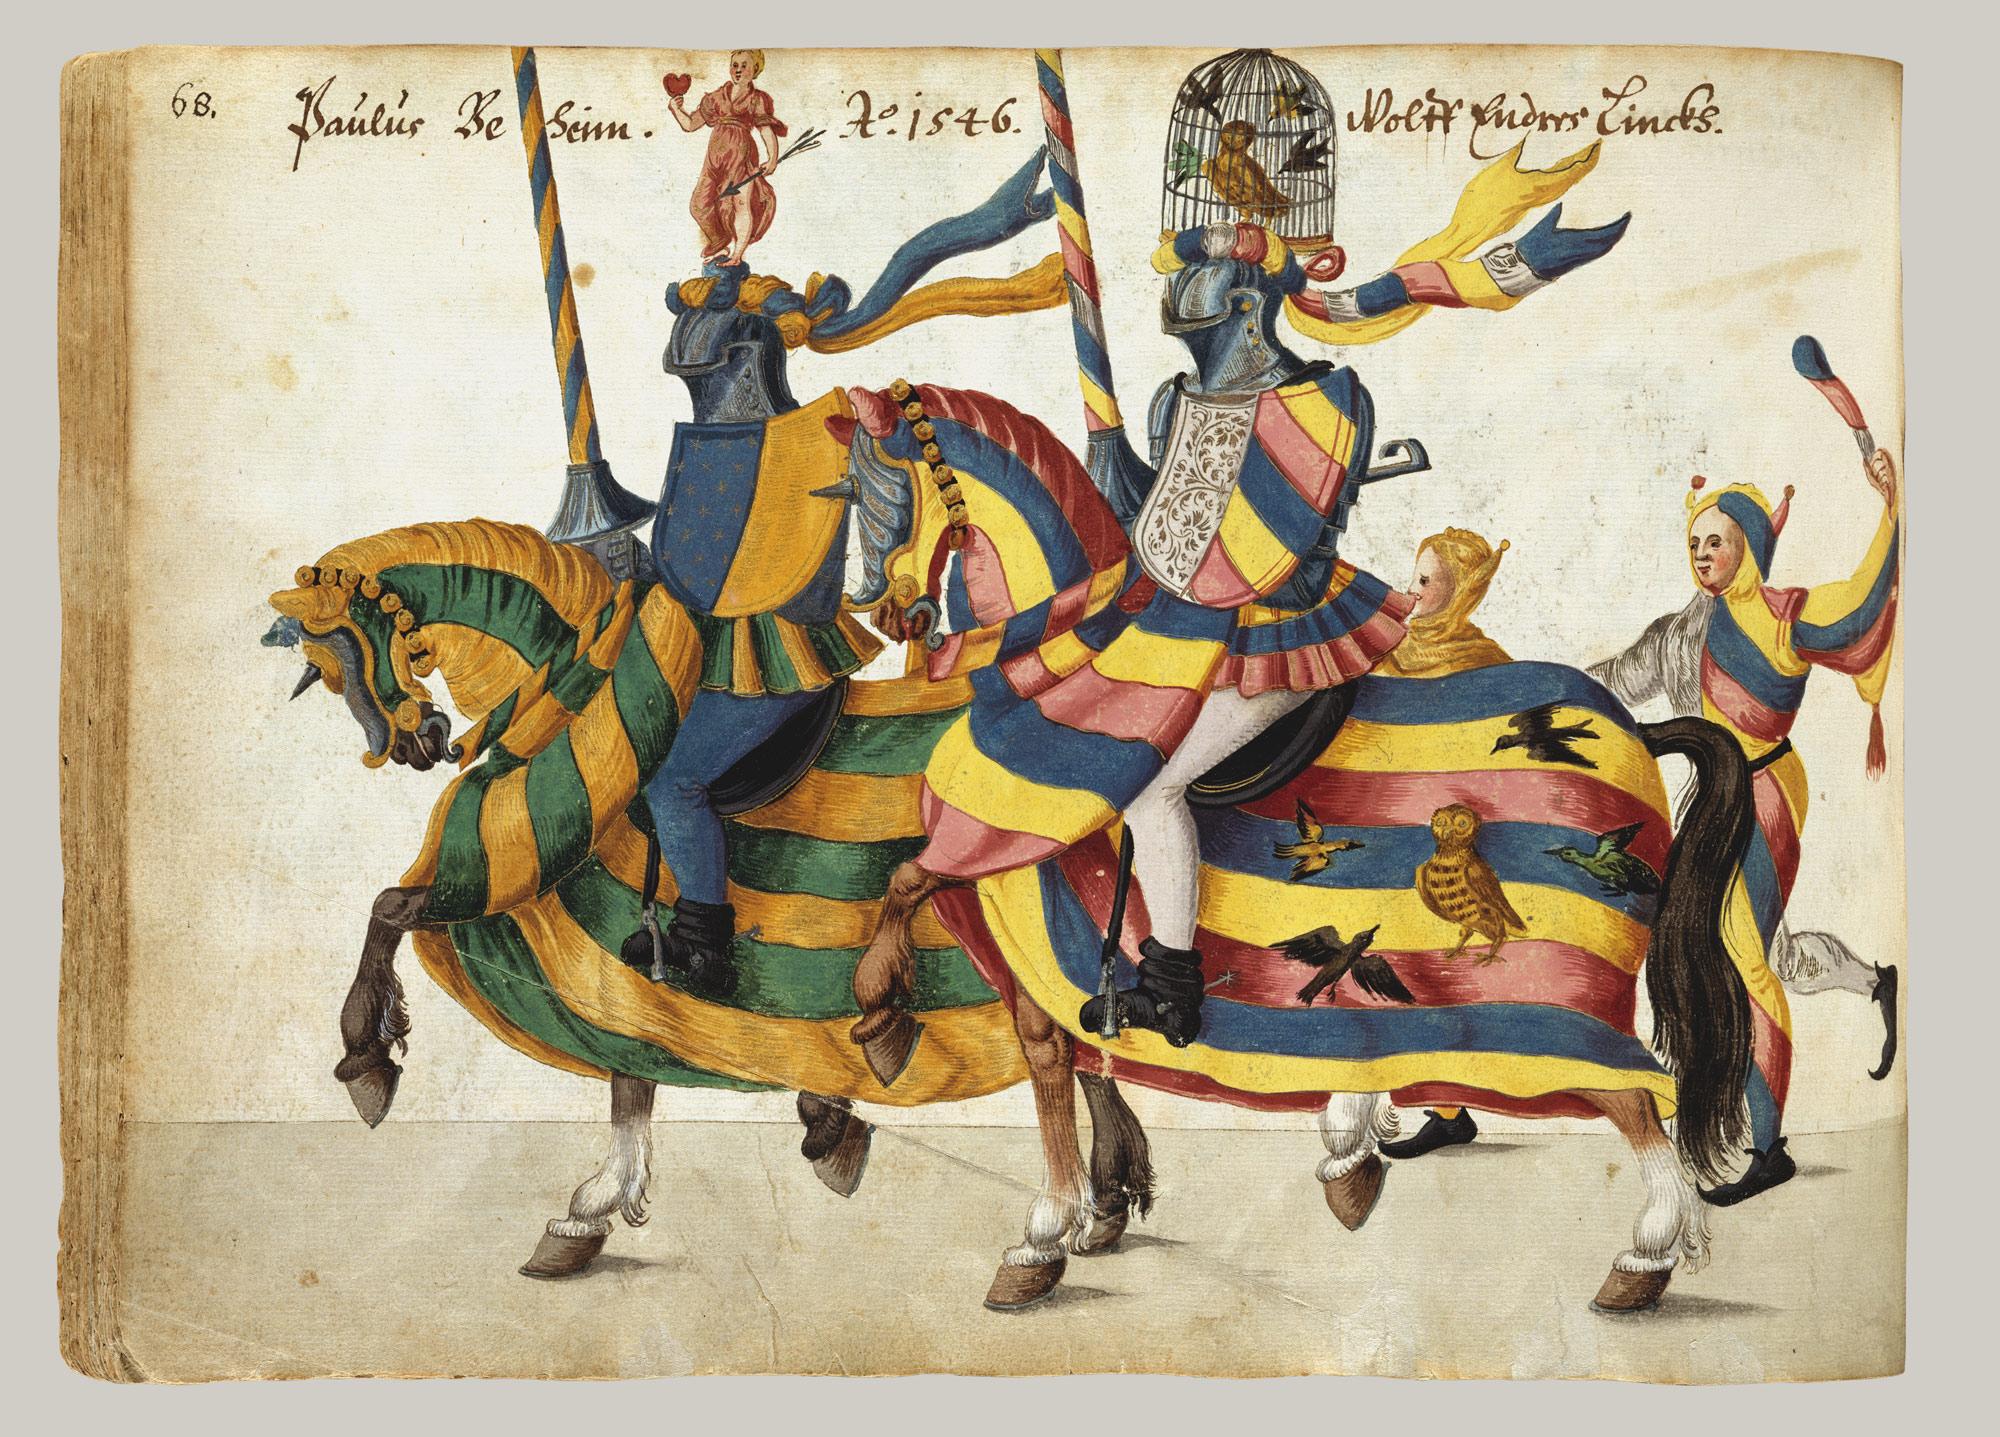 Album of Tournaments and Parades in Nuremberg  Work of Art  Heilbrunn Timeline of Art History